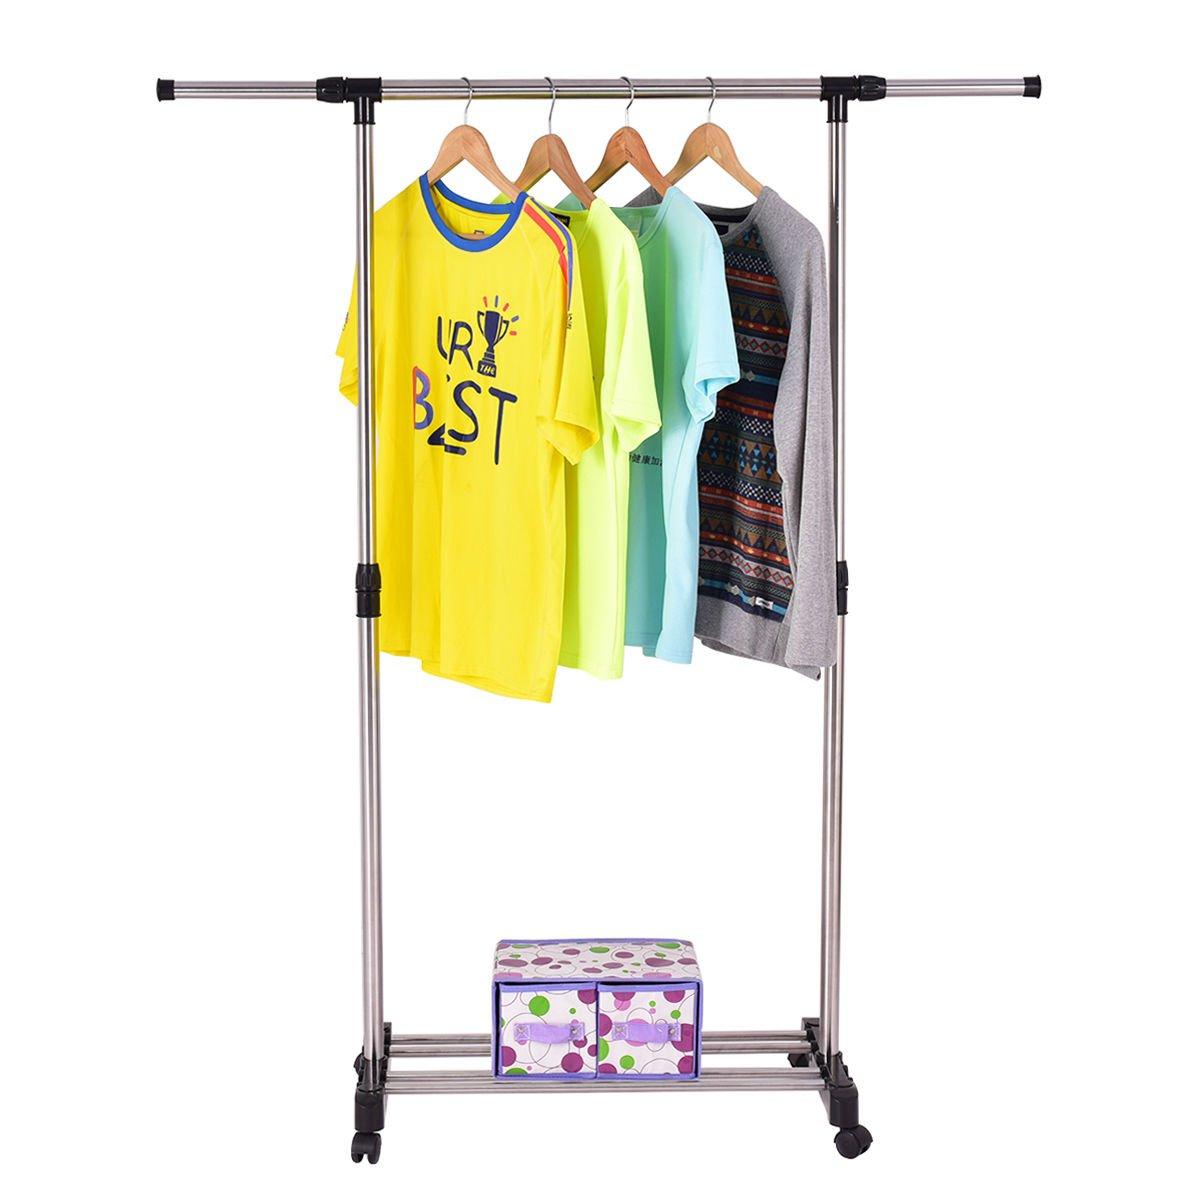 Amazon.com: COLIBROX  Rolling Garment Rack Closet Organizer Shelf